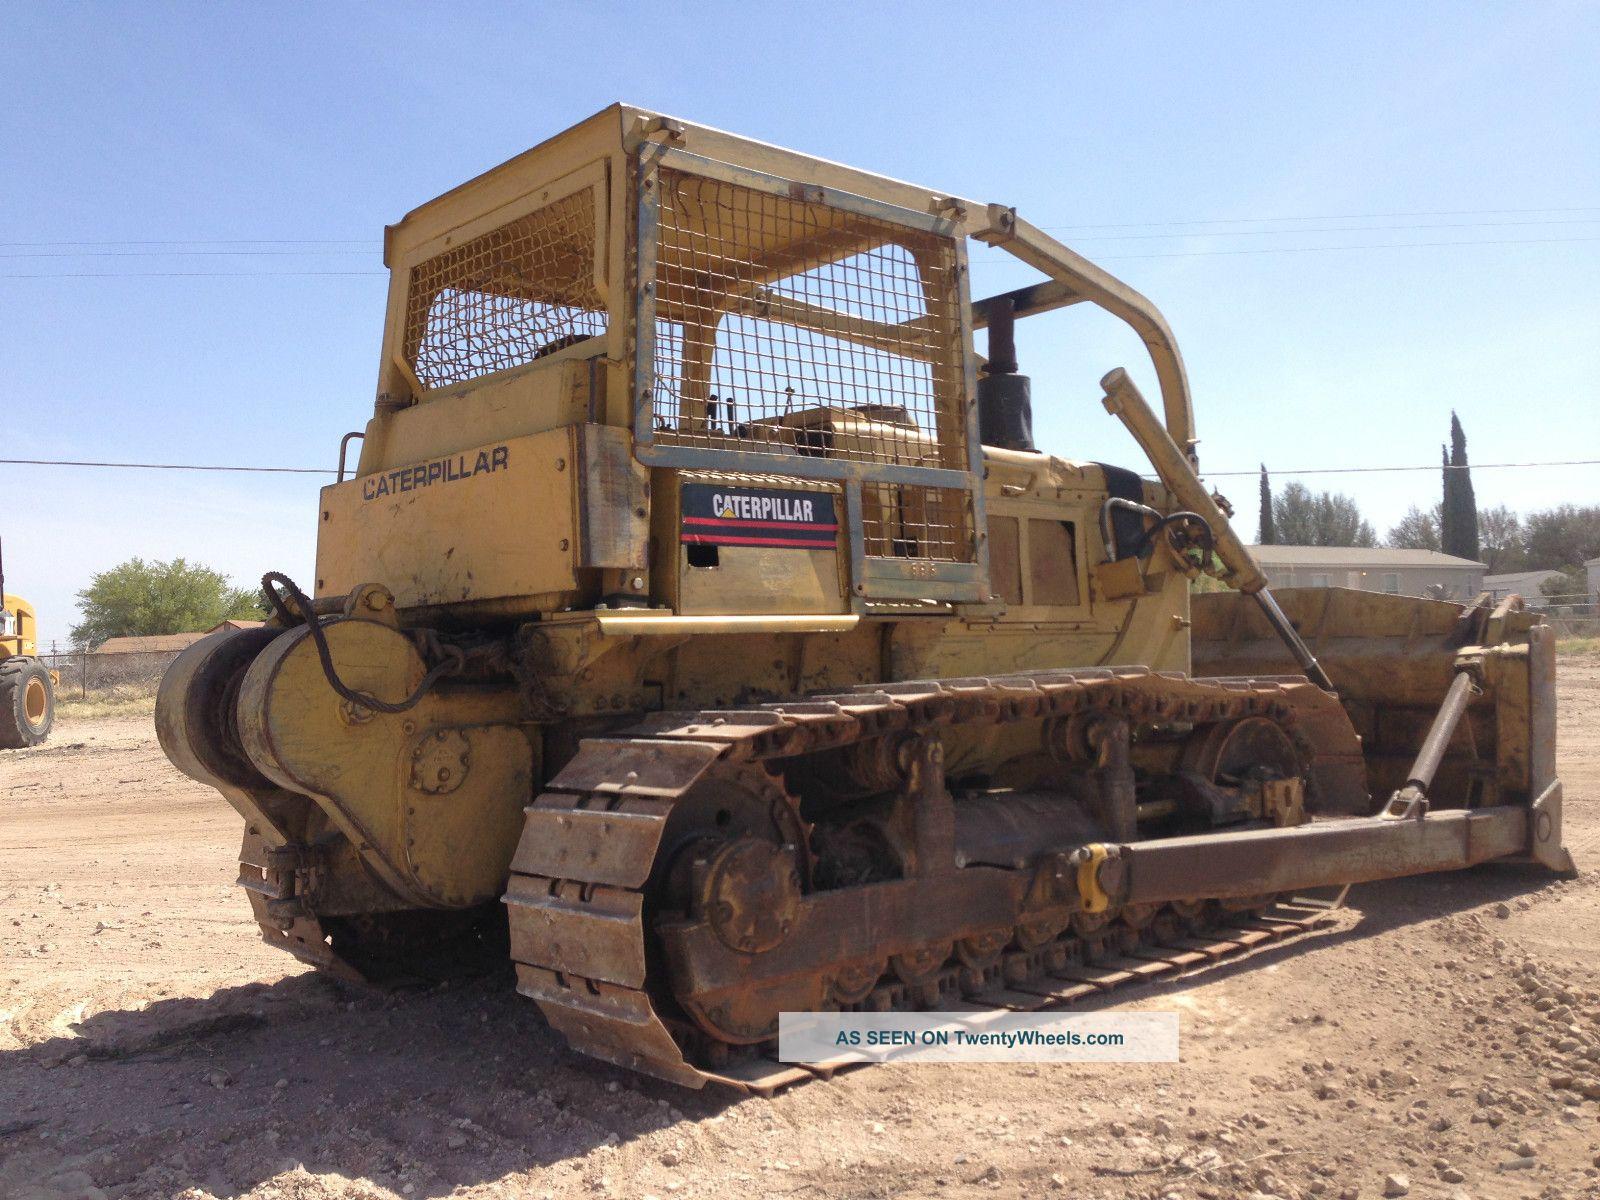 Cat D6d Tractor Related Keywords & Suggestions - Cat D6d